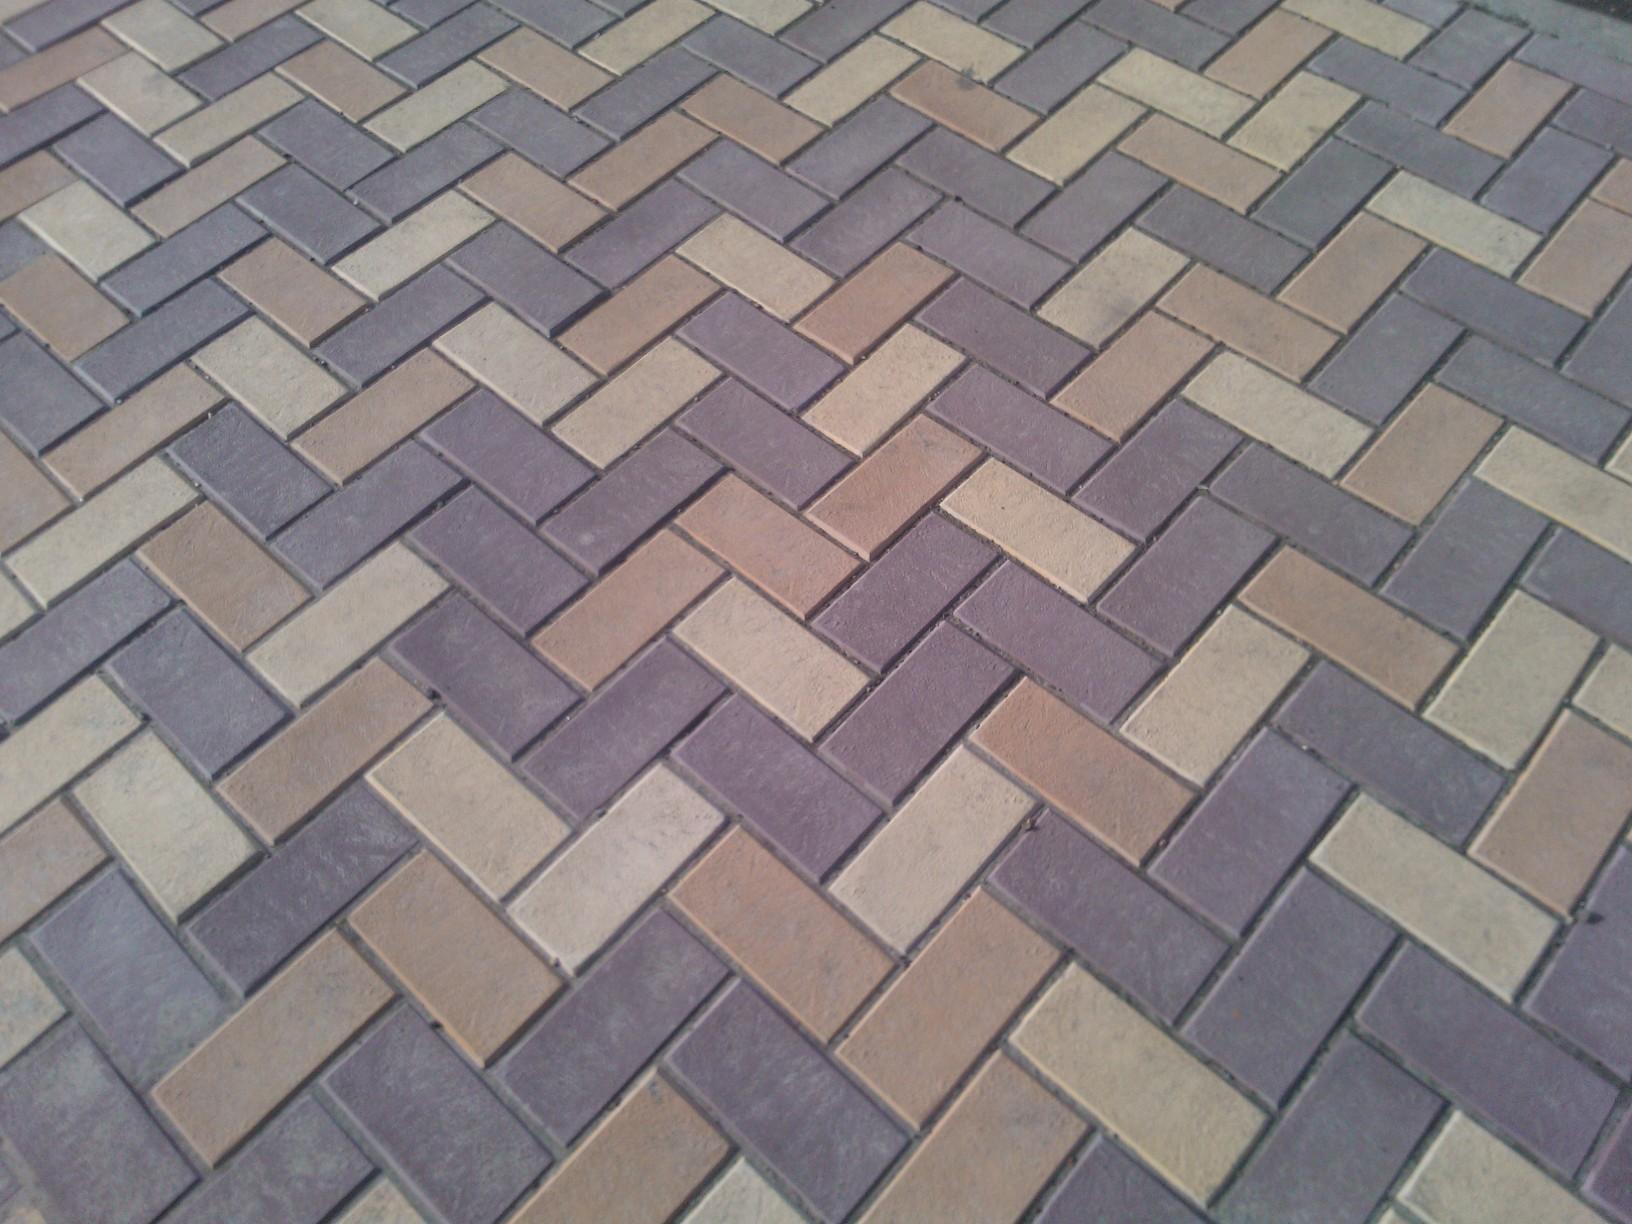 Укладка тротуарной брусчатки